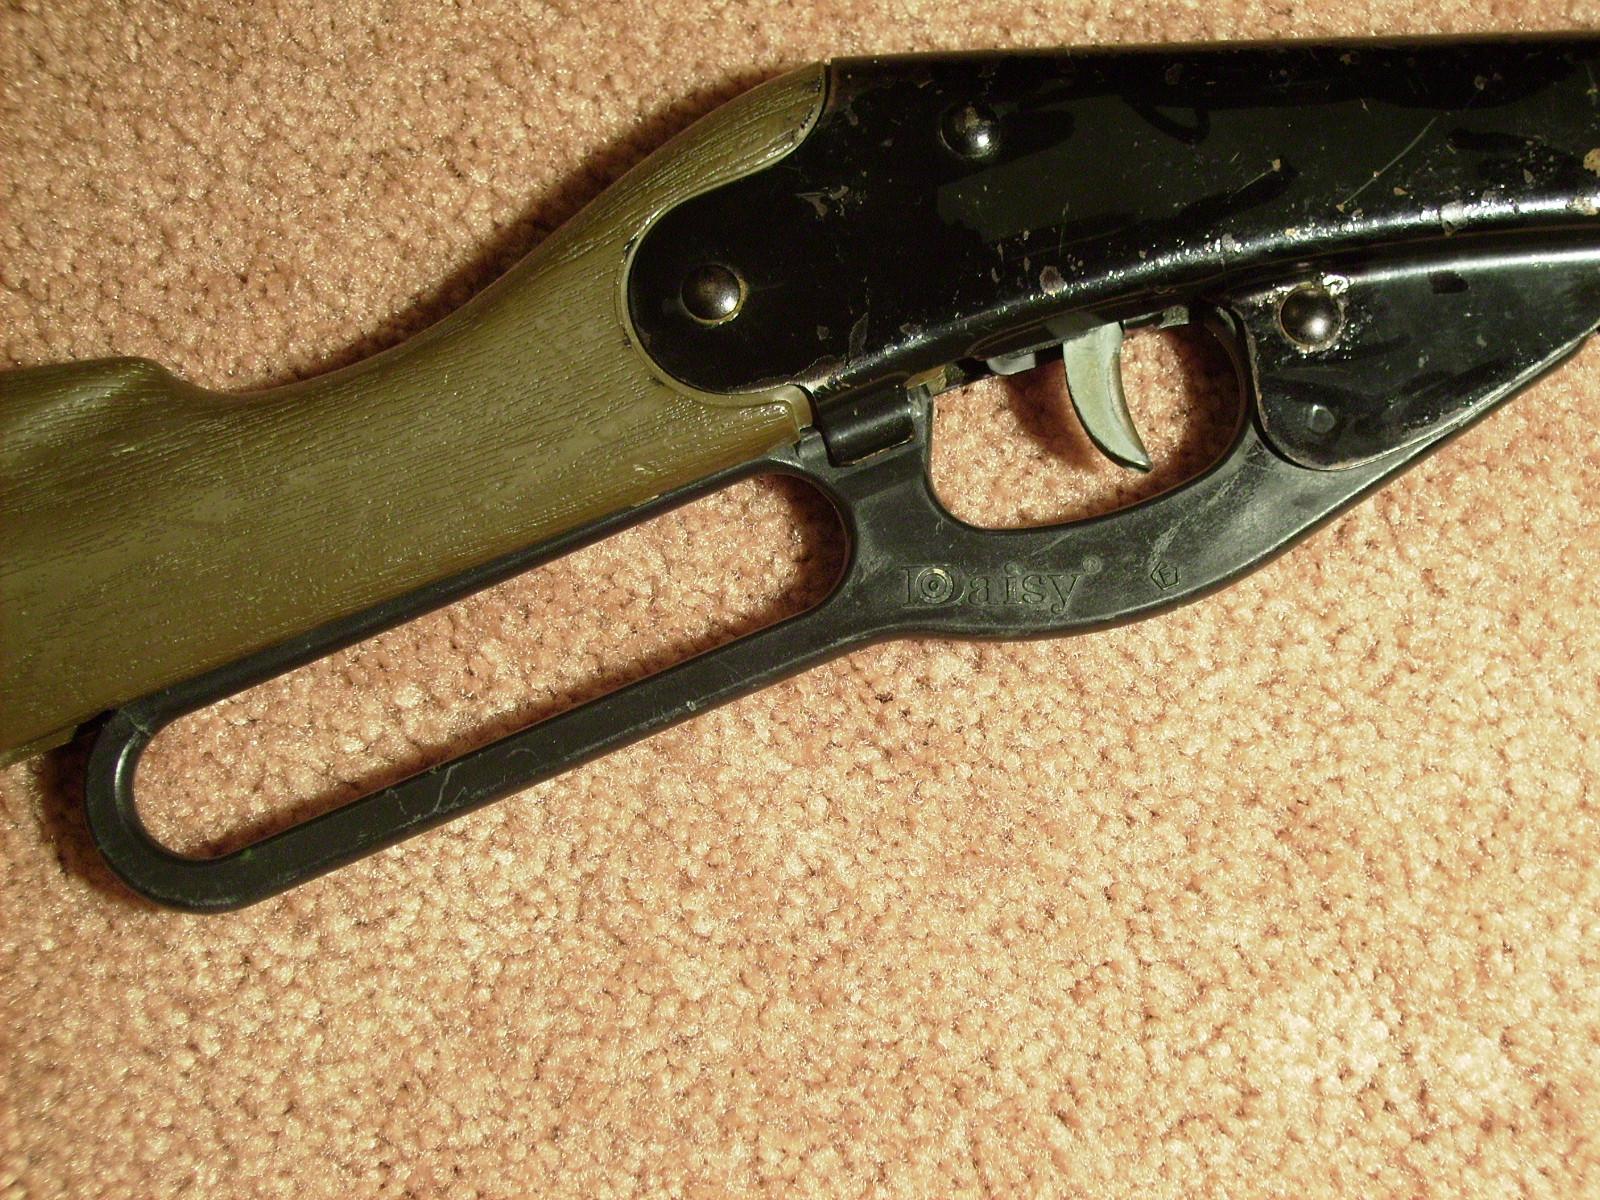 daisy model 960 toy gun manual